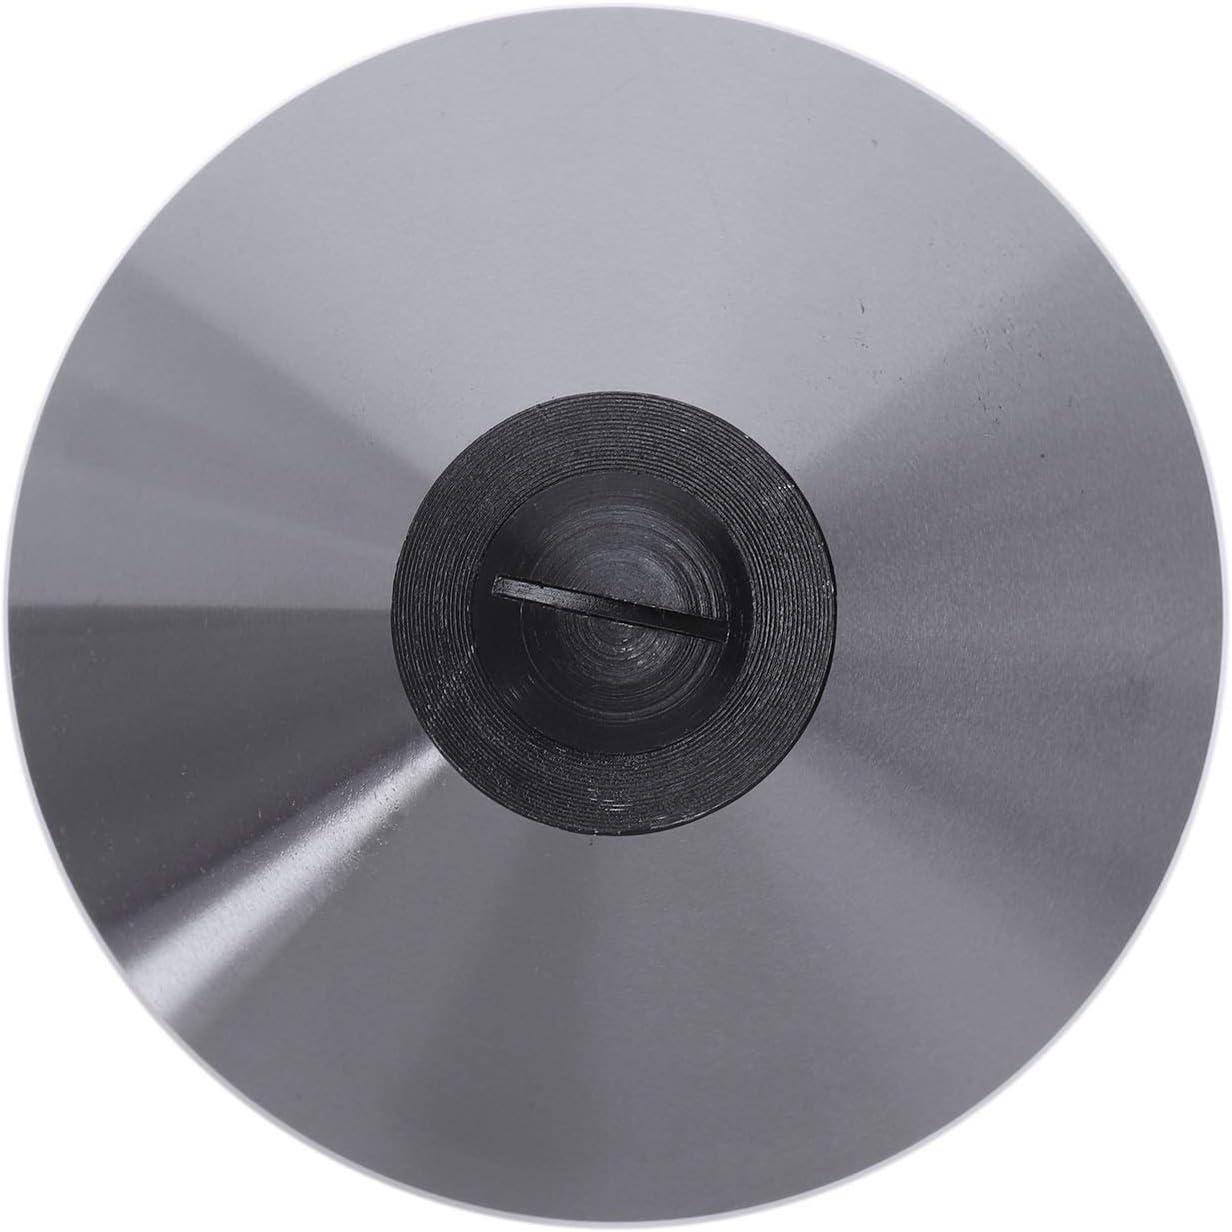 SXM-SXM Umbrella Lathe Apex Morse Taper-Shank 5 Lathe Umbrella Thimble Diameter Drill